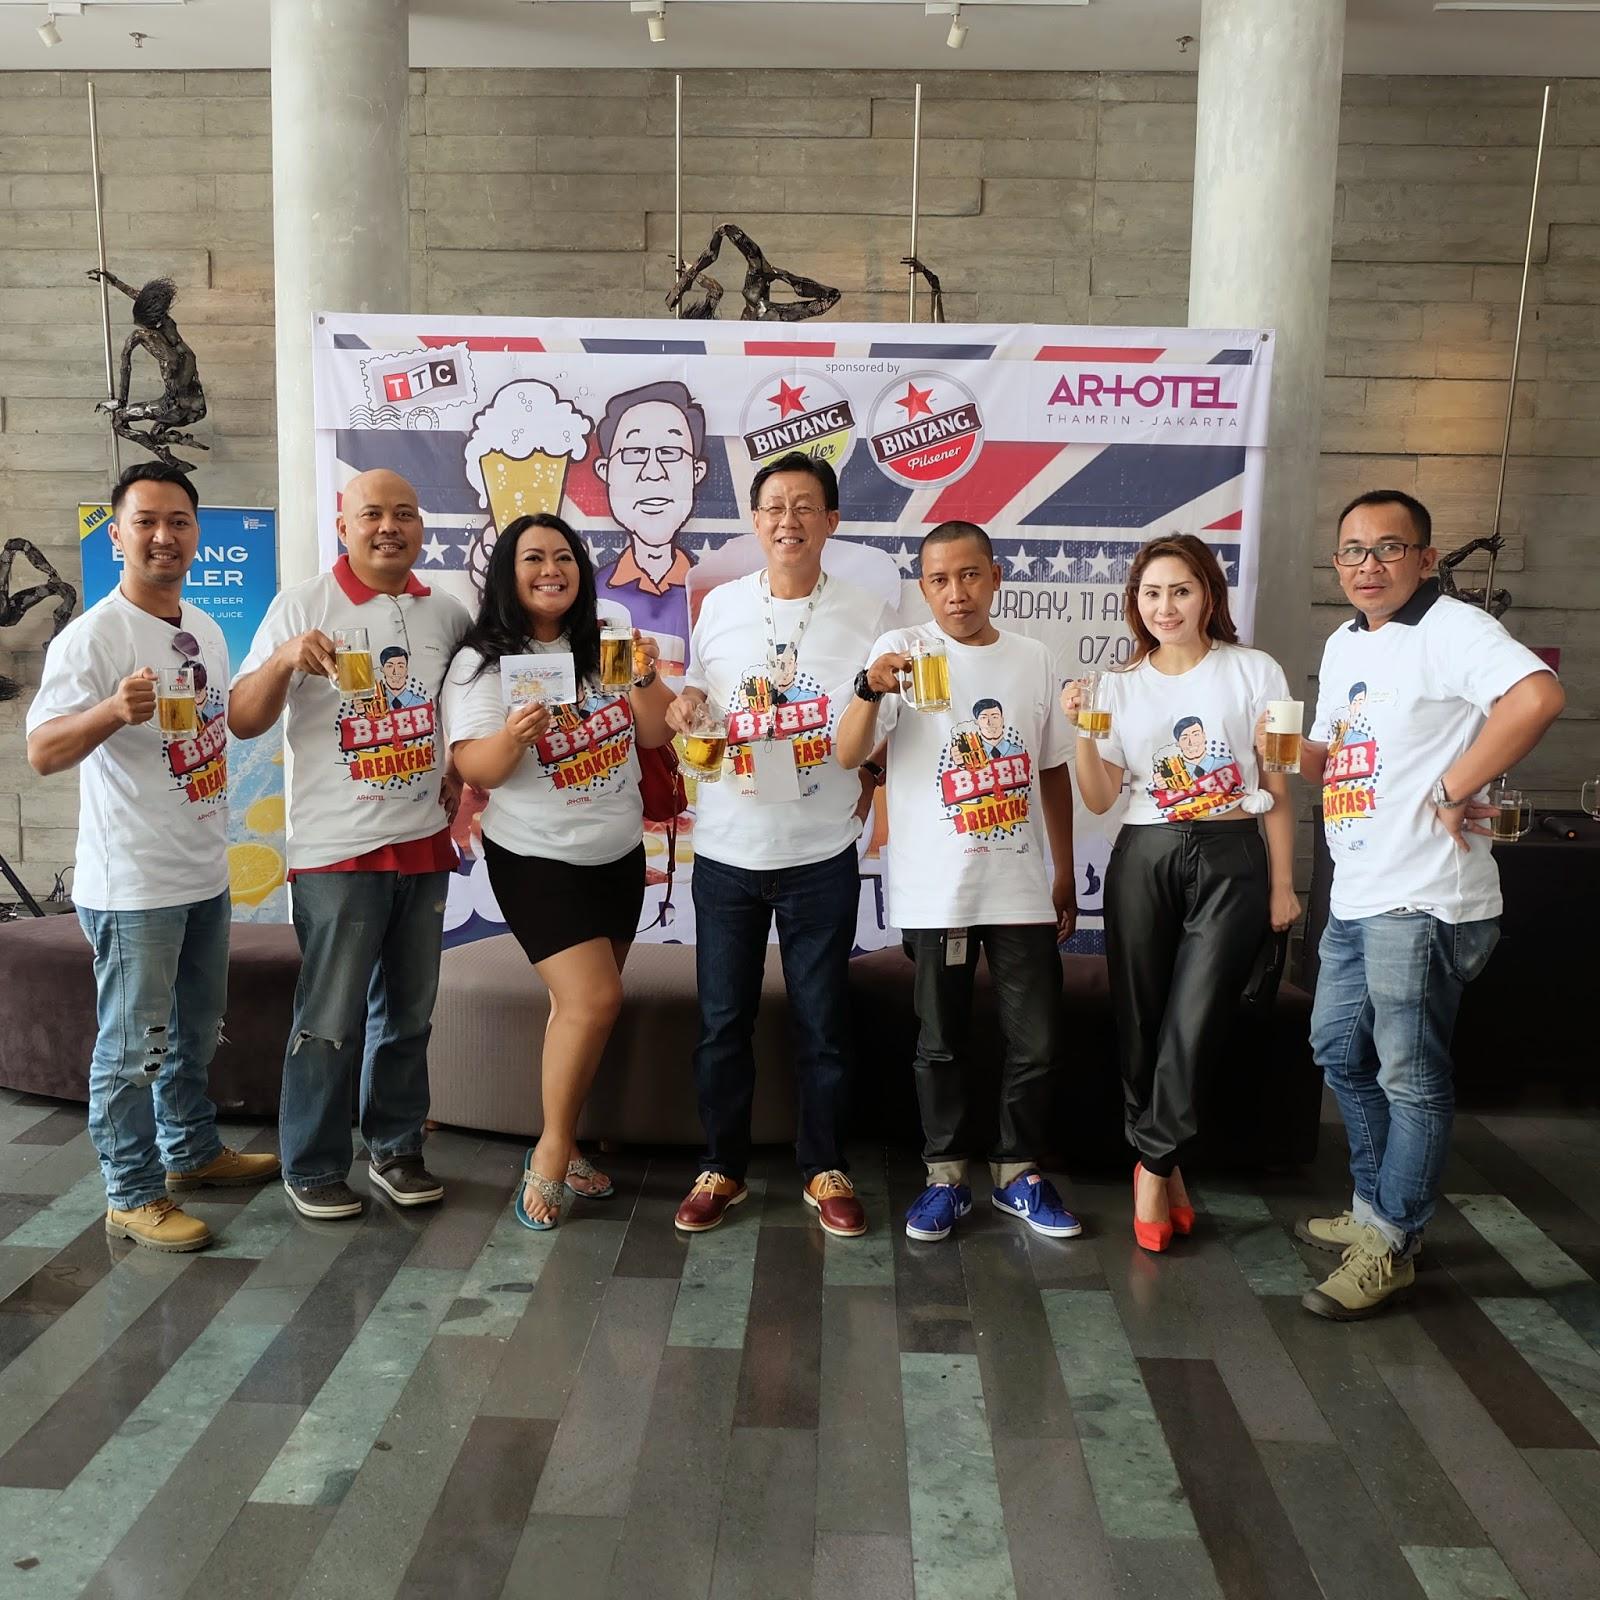 Burhan Abes Blog Beer And Breakfast Artotel Thamrin Jakarta